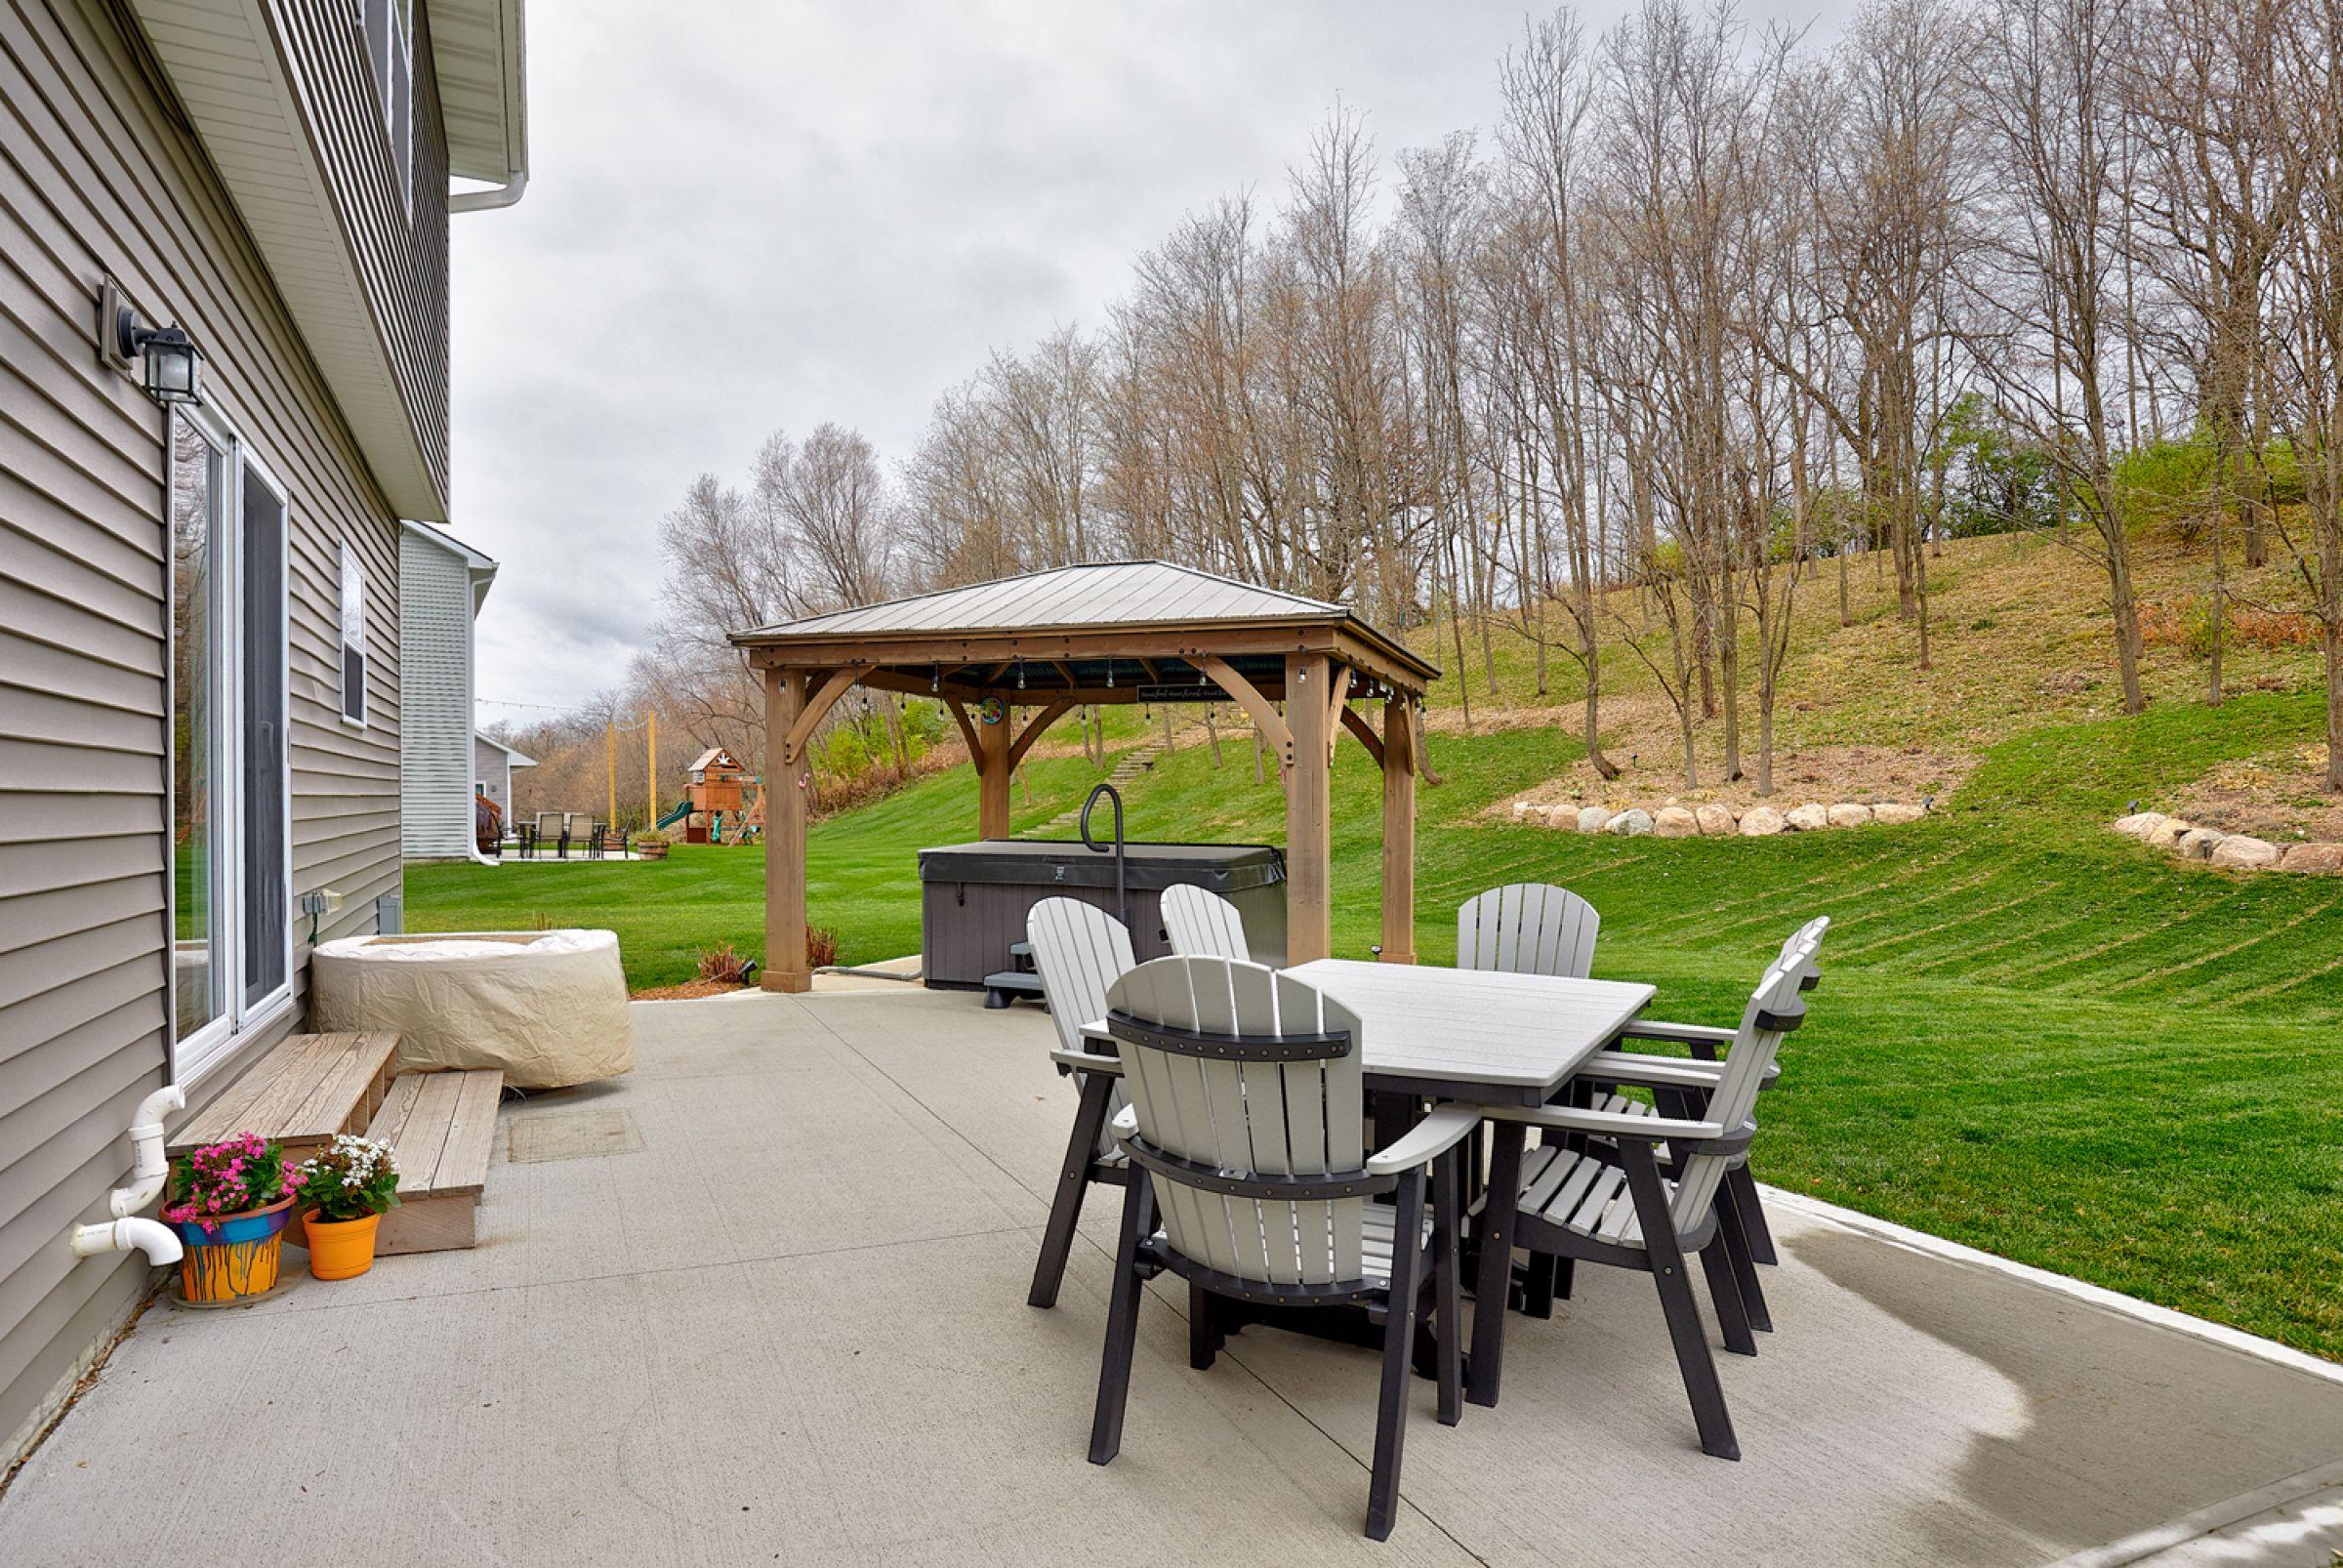 residential-warren-county-iowa-1-acres-listing-number-15254-5-2020-11-11-165806.jpg